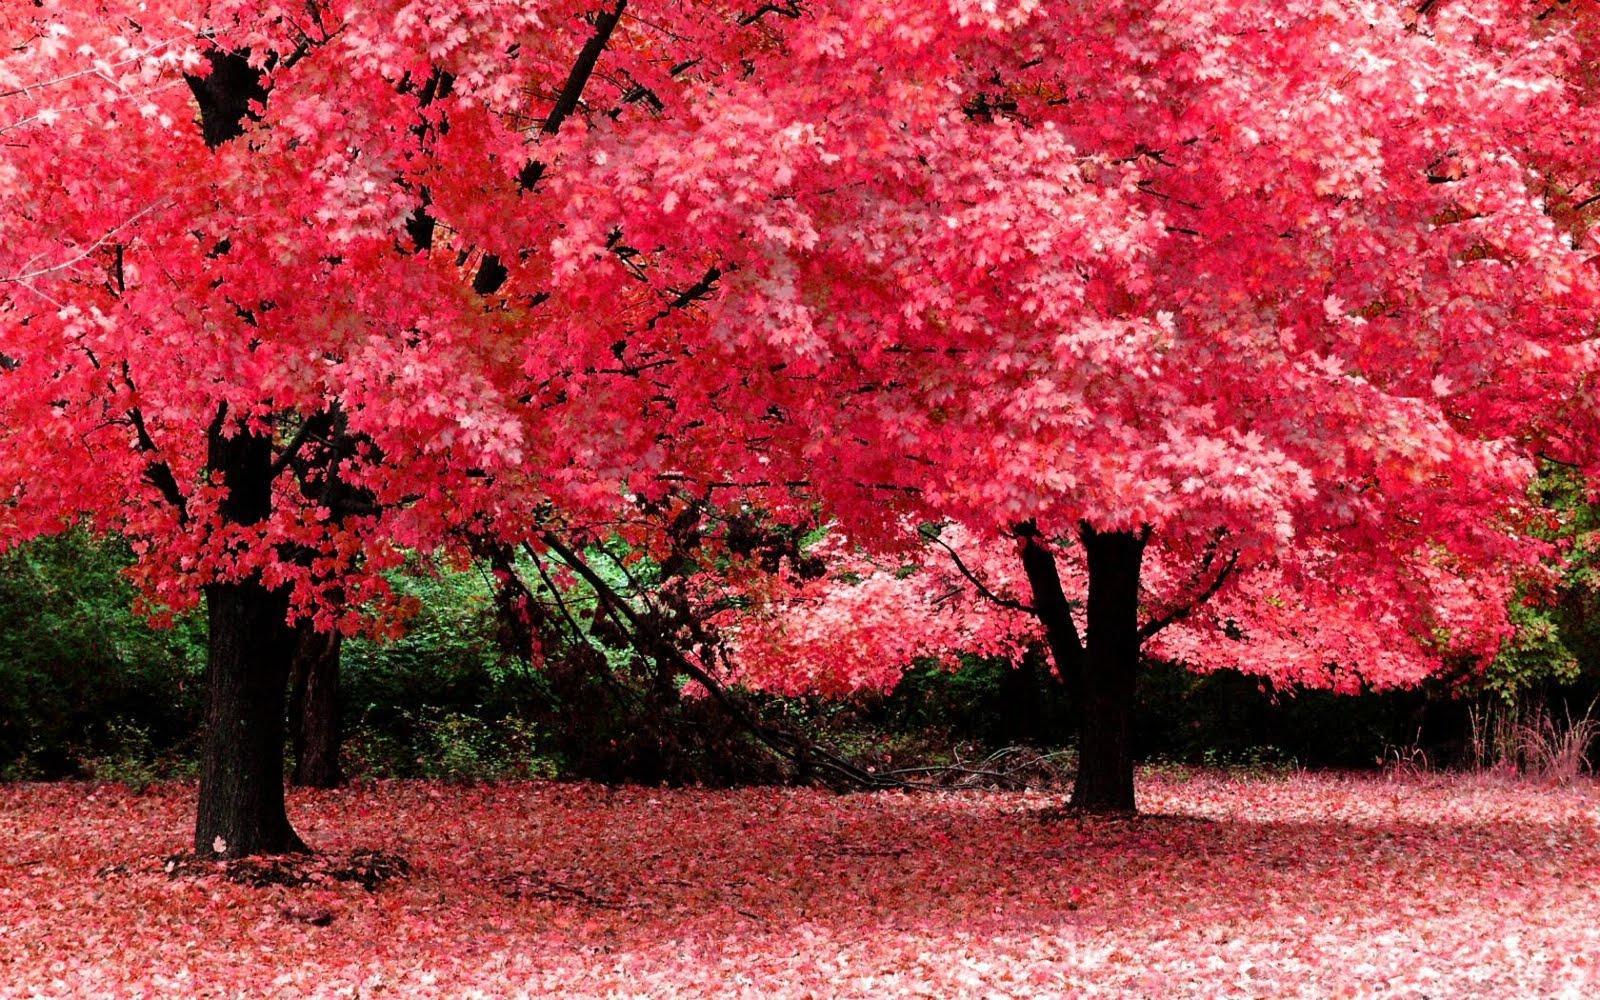 Autumn Season Nature Fantasy Wallpaper Hd Wallpaper 1600x1000